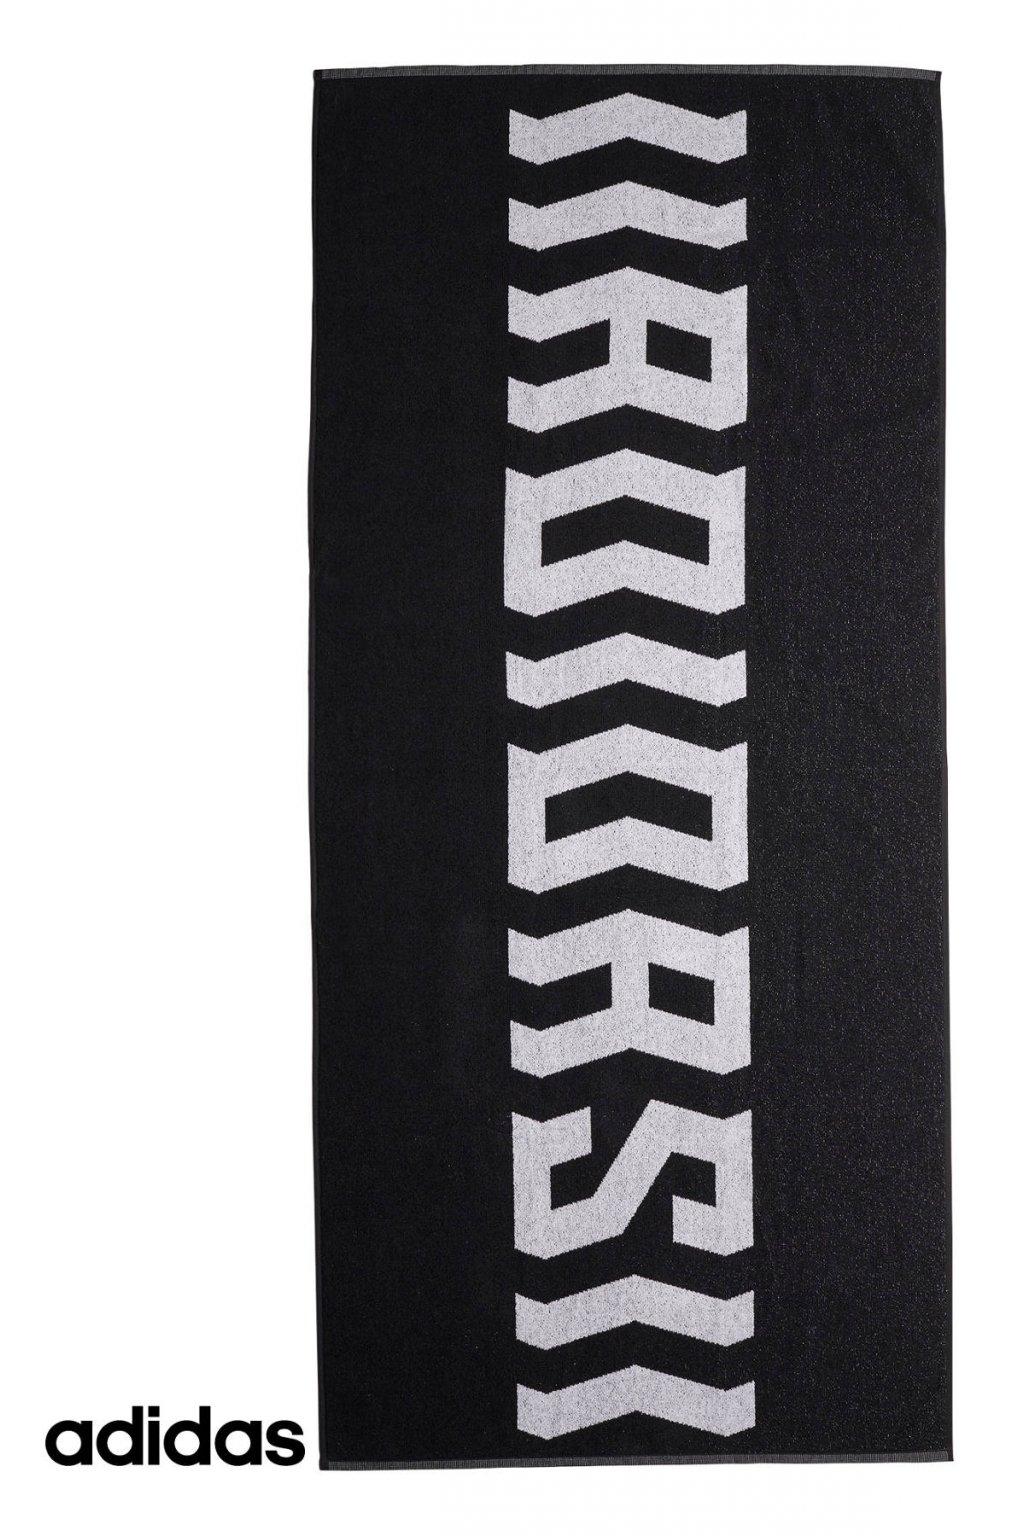 fm7607 uterak adidas training towel cierny